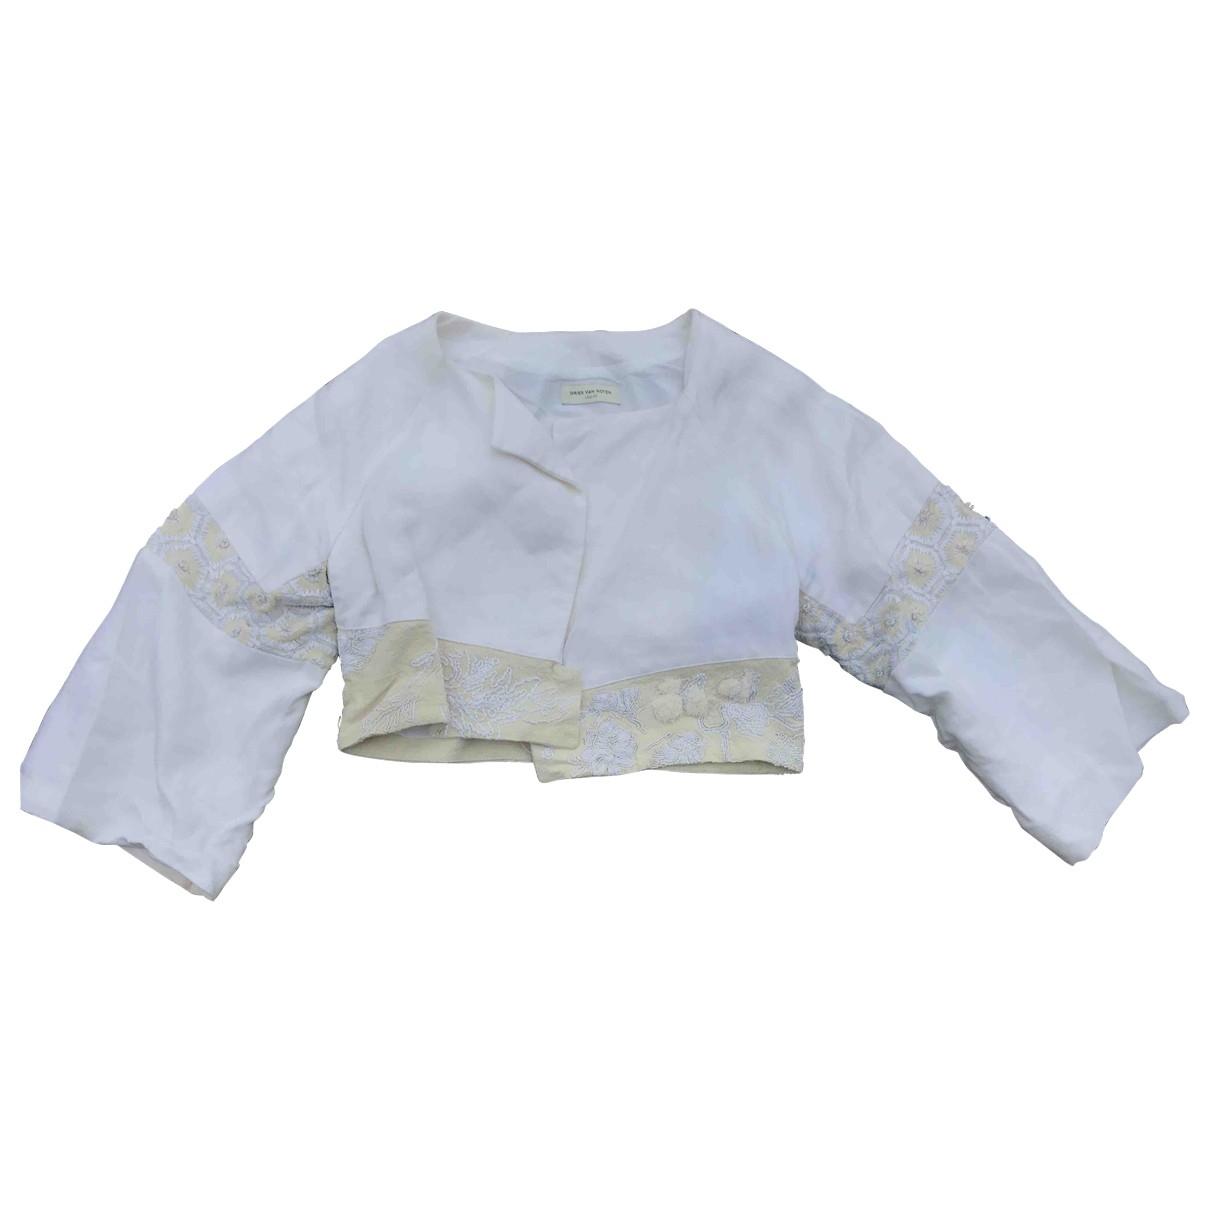 Dries Van Noten \N White Cotton jacket for Women 40 FR